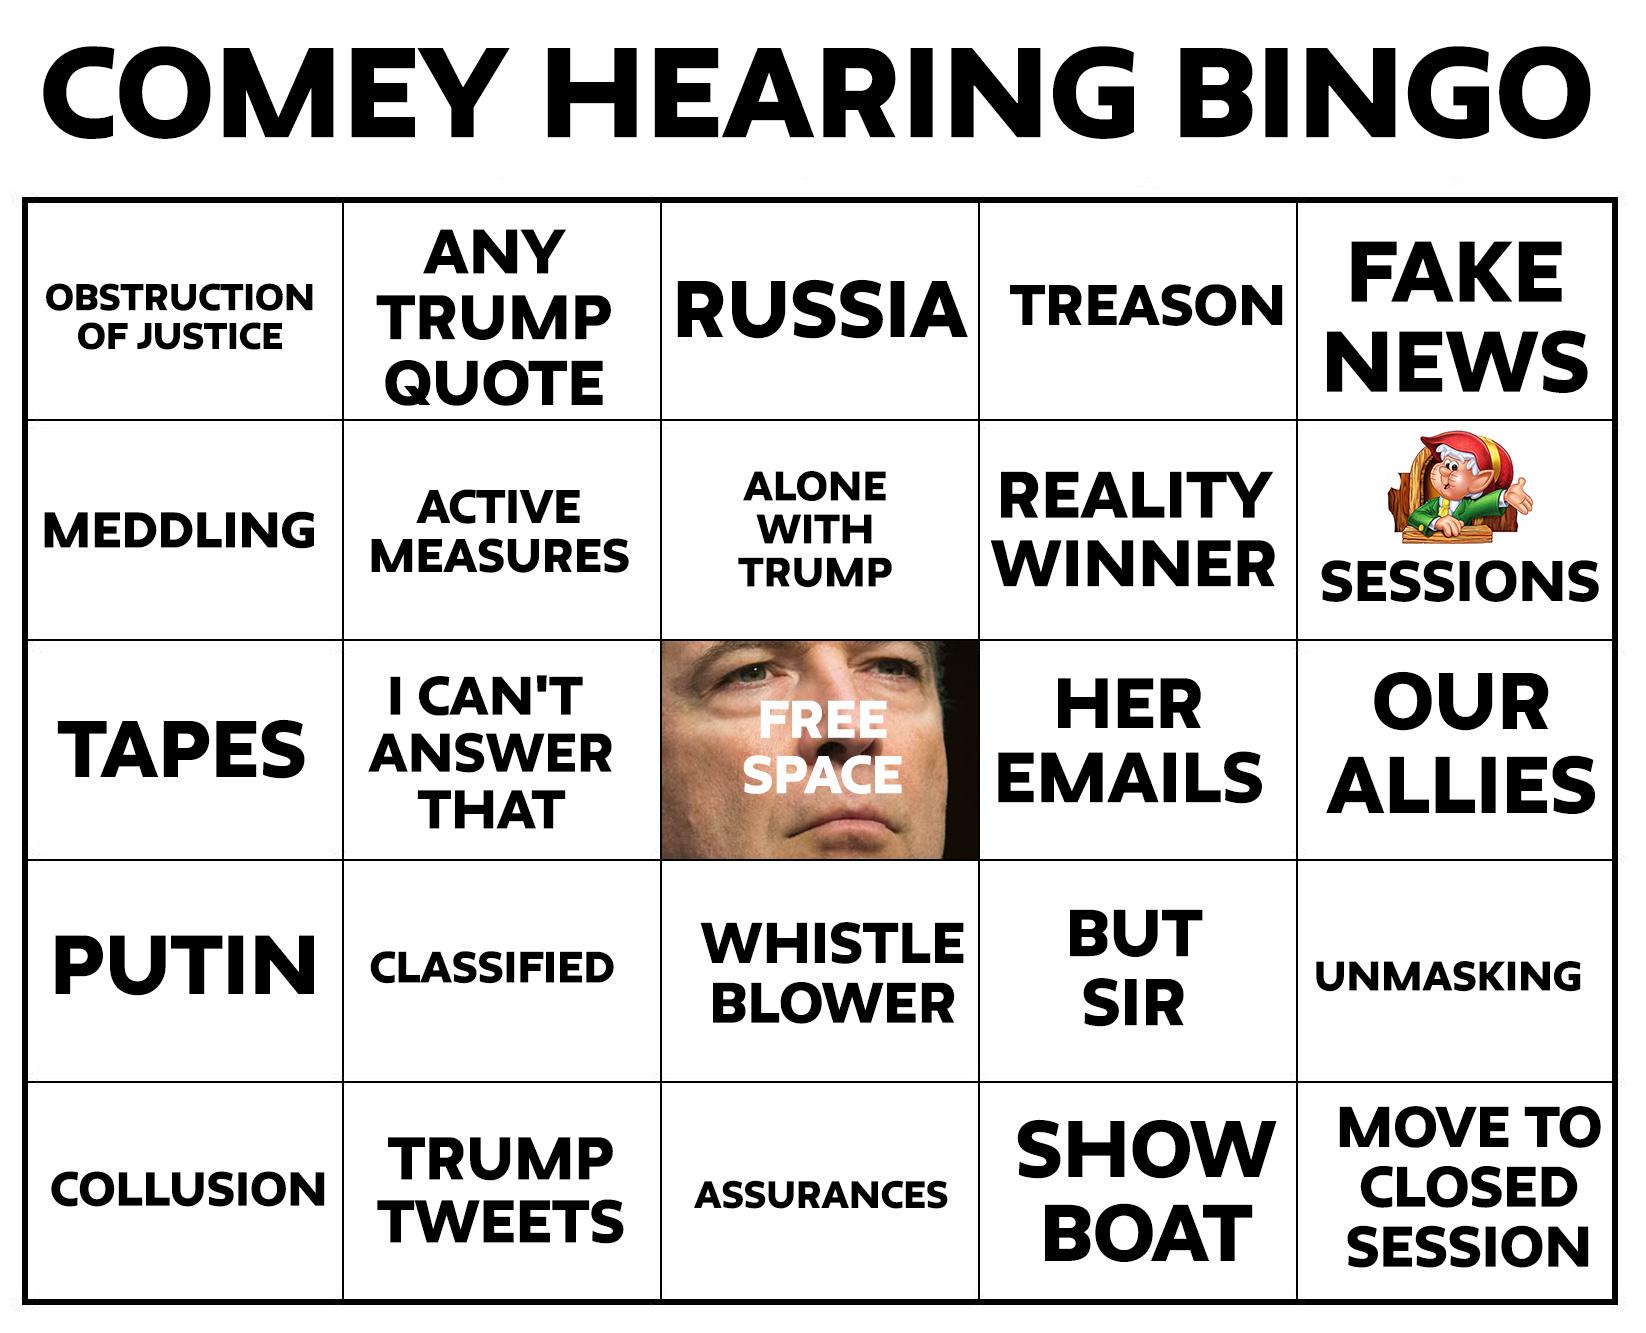 IMAGE(http://media.boingboing.net/wp-content/uploads/2017/06/comey-hearing-bingo.jpg)